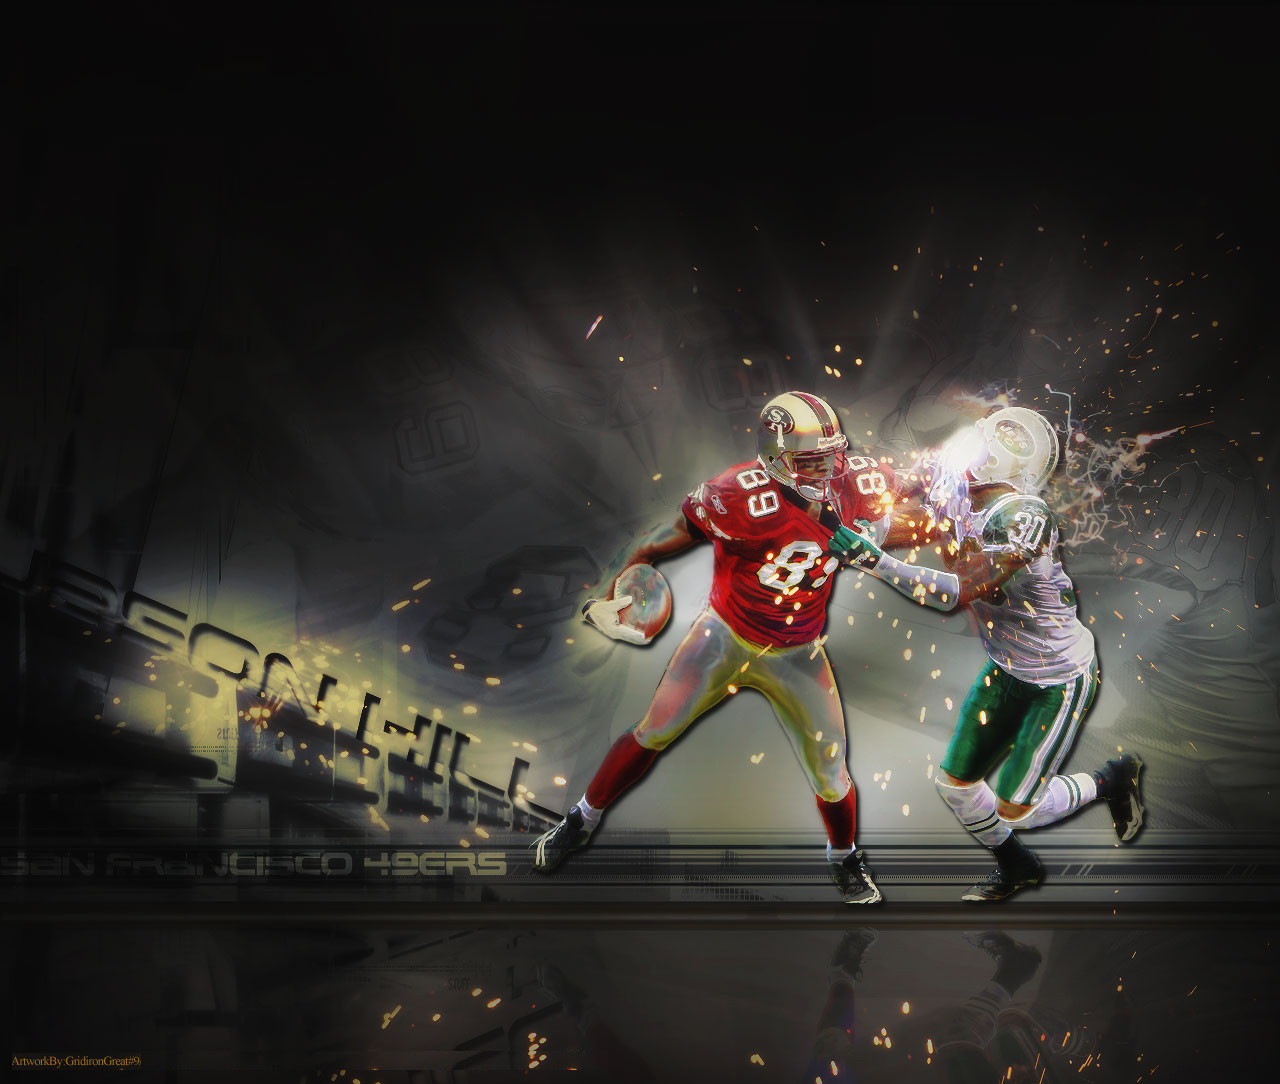 Hill Jason wallpaper San Francisco 49ers wallpaper 1280x1024 1280x1084